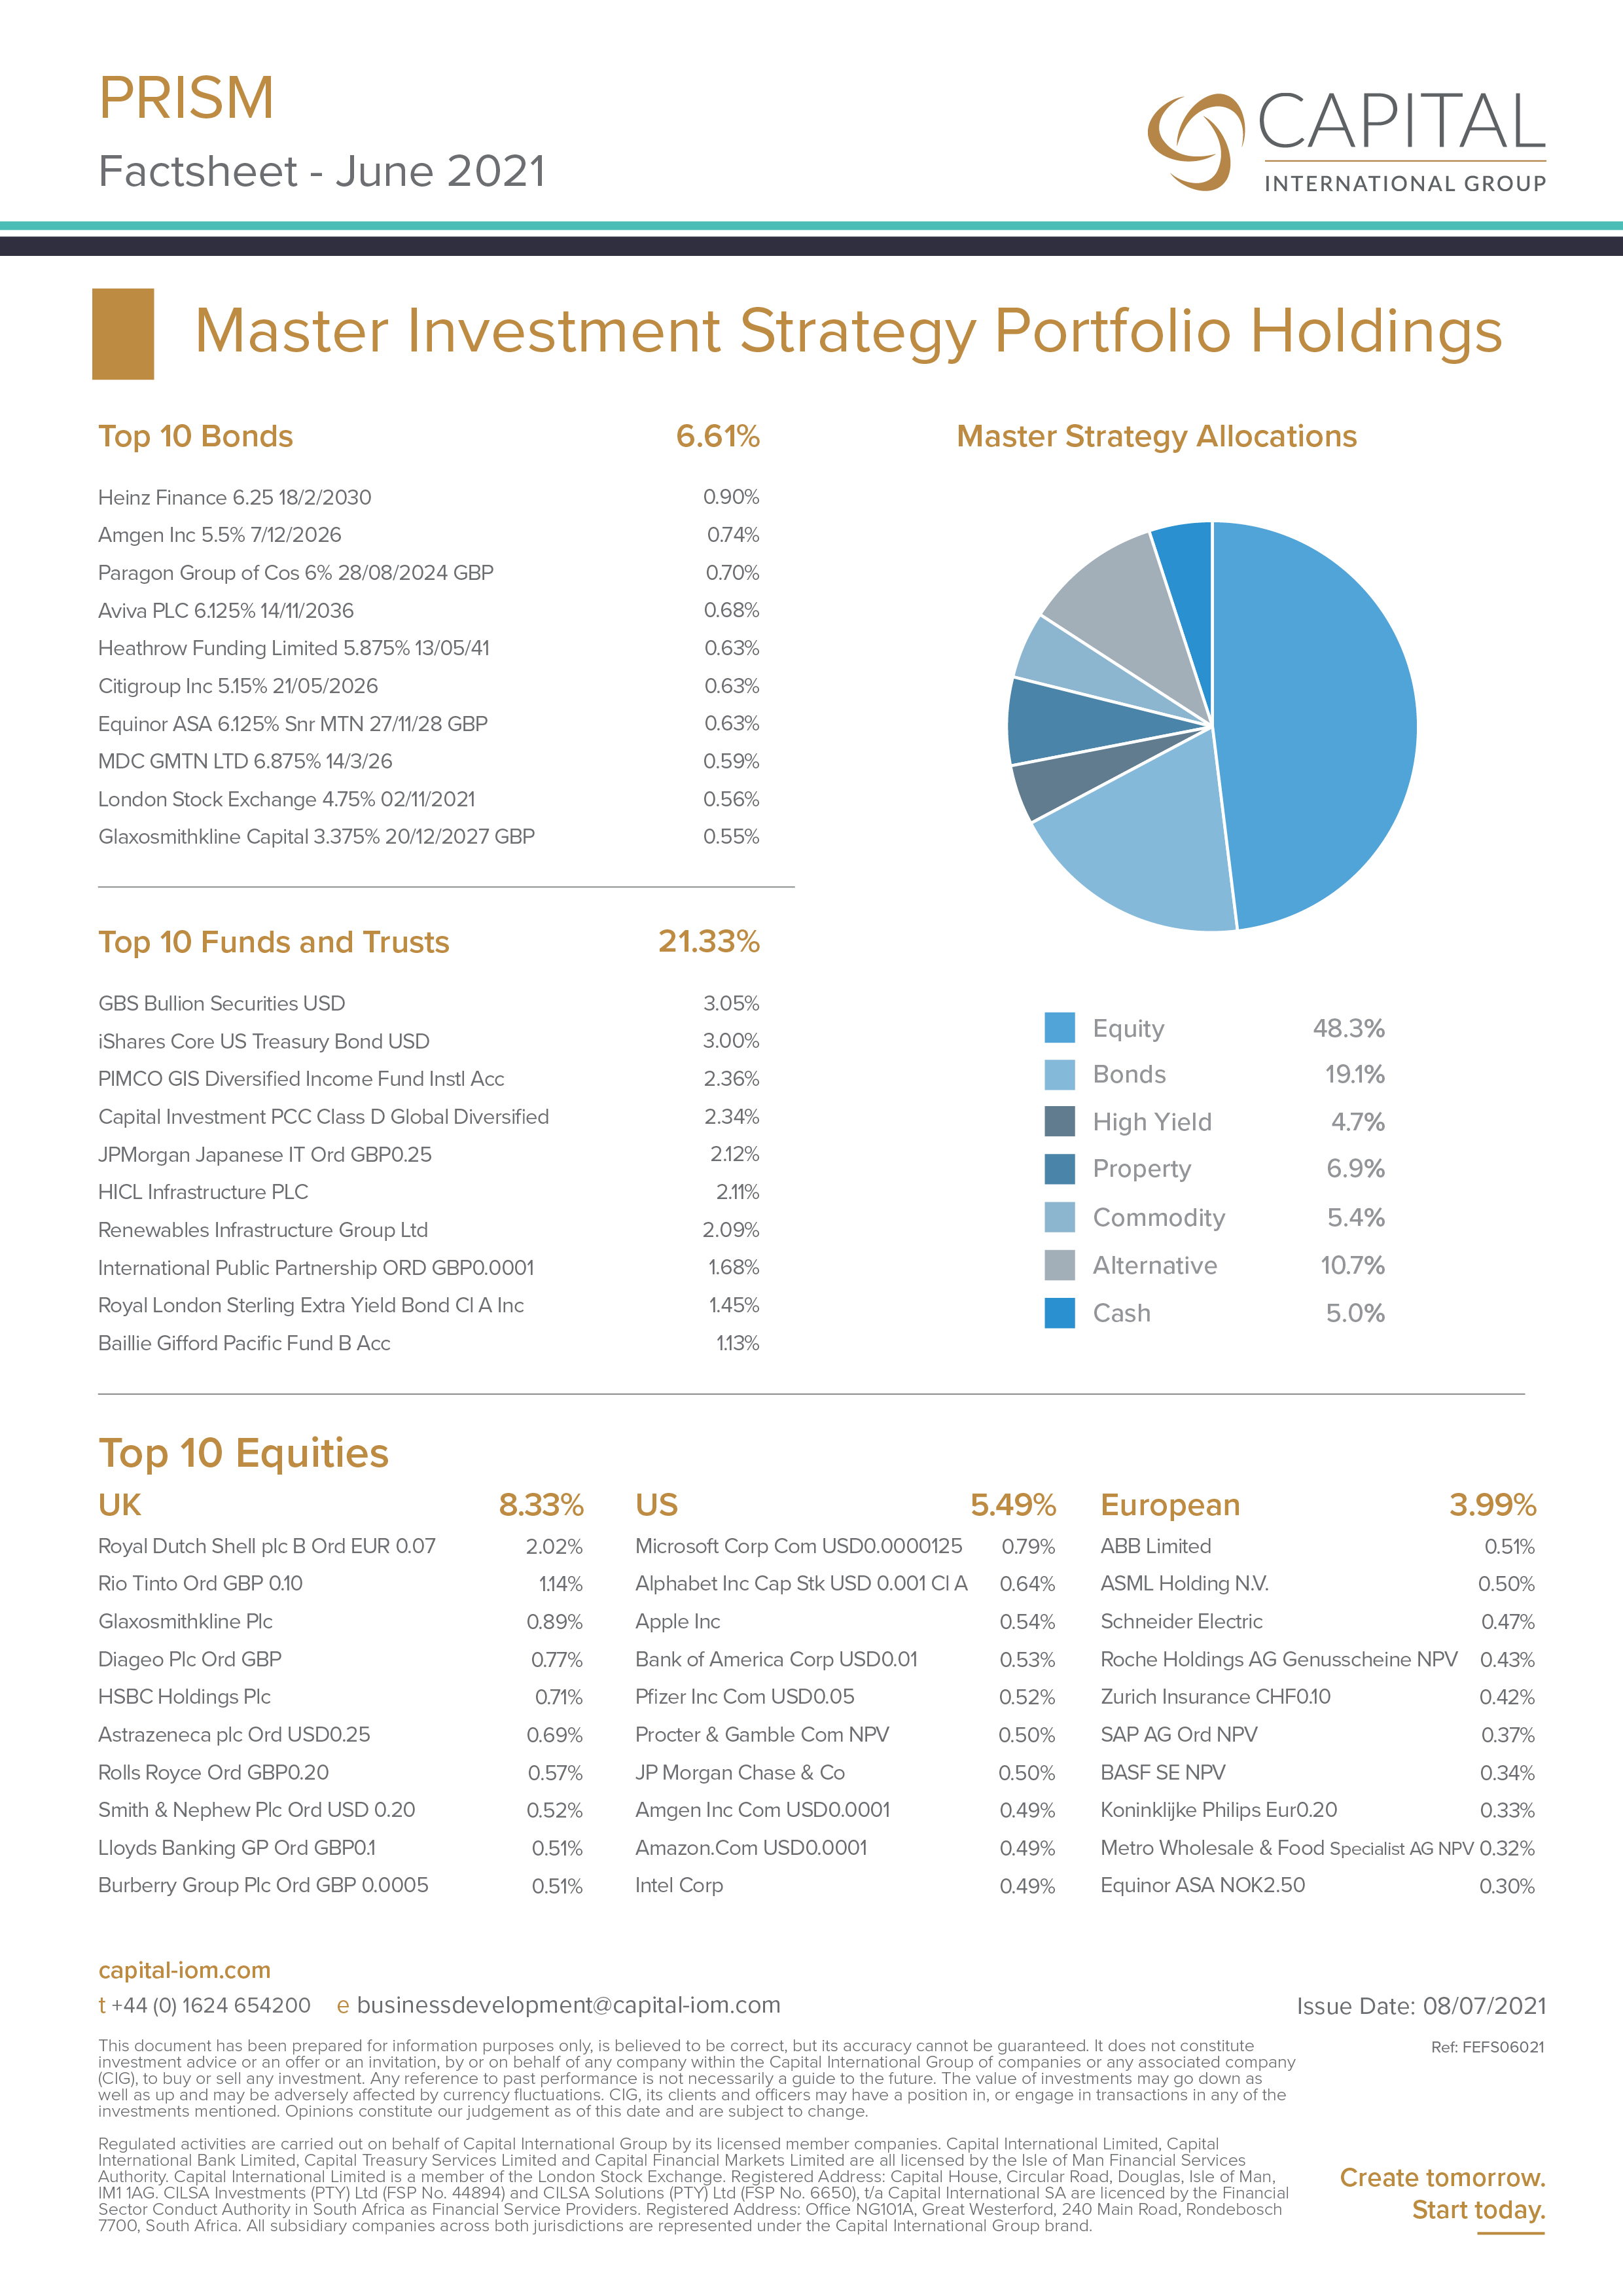 Prism Top 10 Holdings June 2021